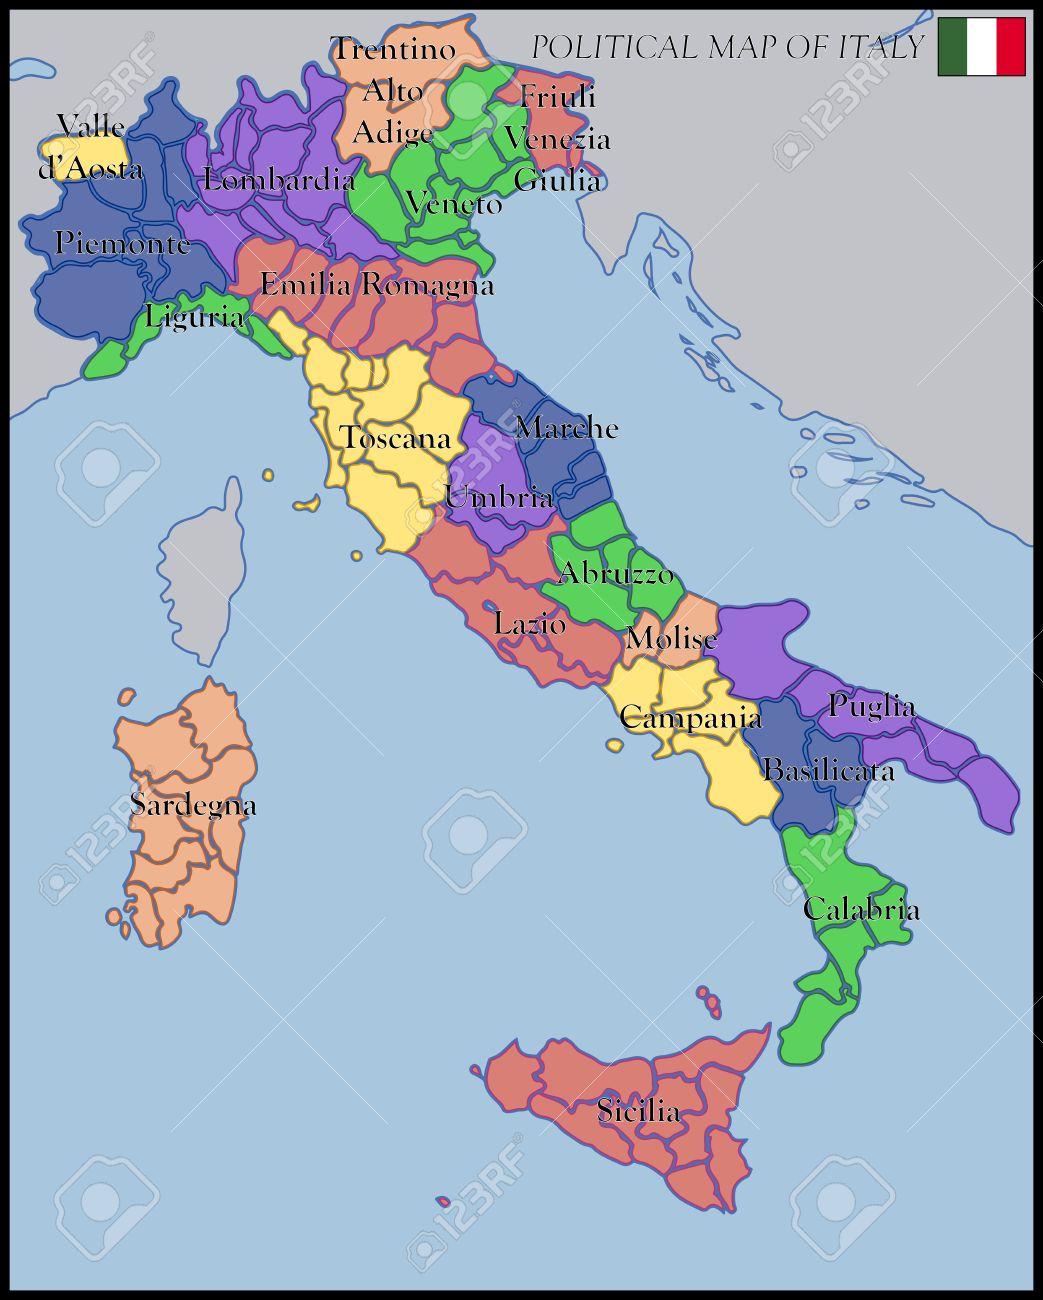 italia mapa politico Mapa Político De Italia, Ilustraciones Vectoriales, Clip Art  italia mapa politico